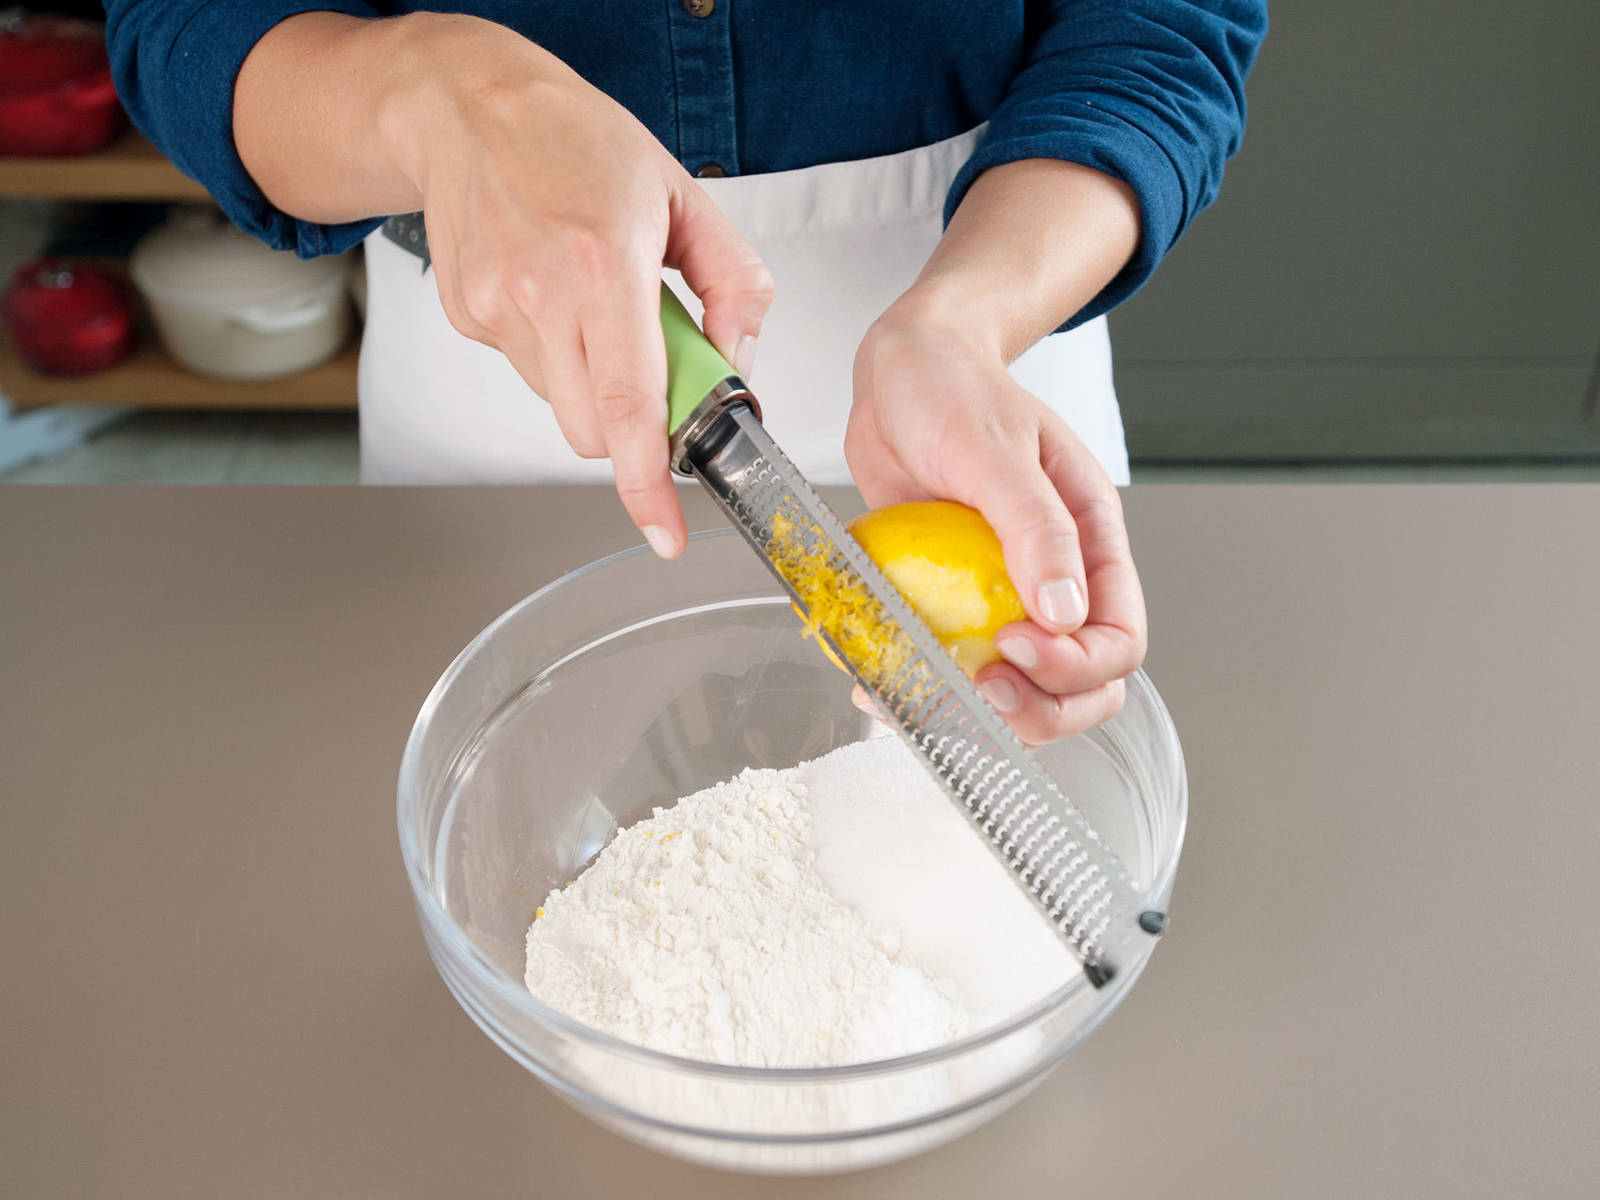 Preheat oven to 175°C/350°F. In a large bowl, combine flour, sugar, baking powder, salt, and lemon zest.